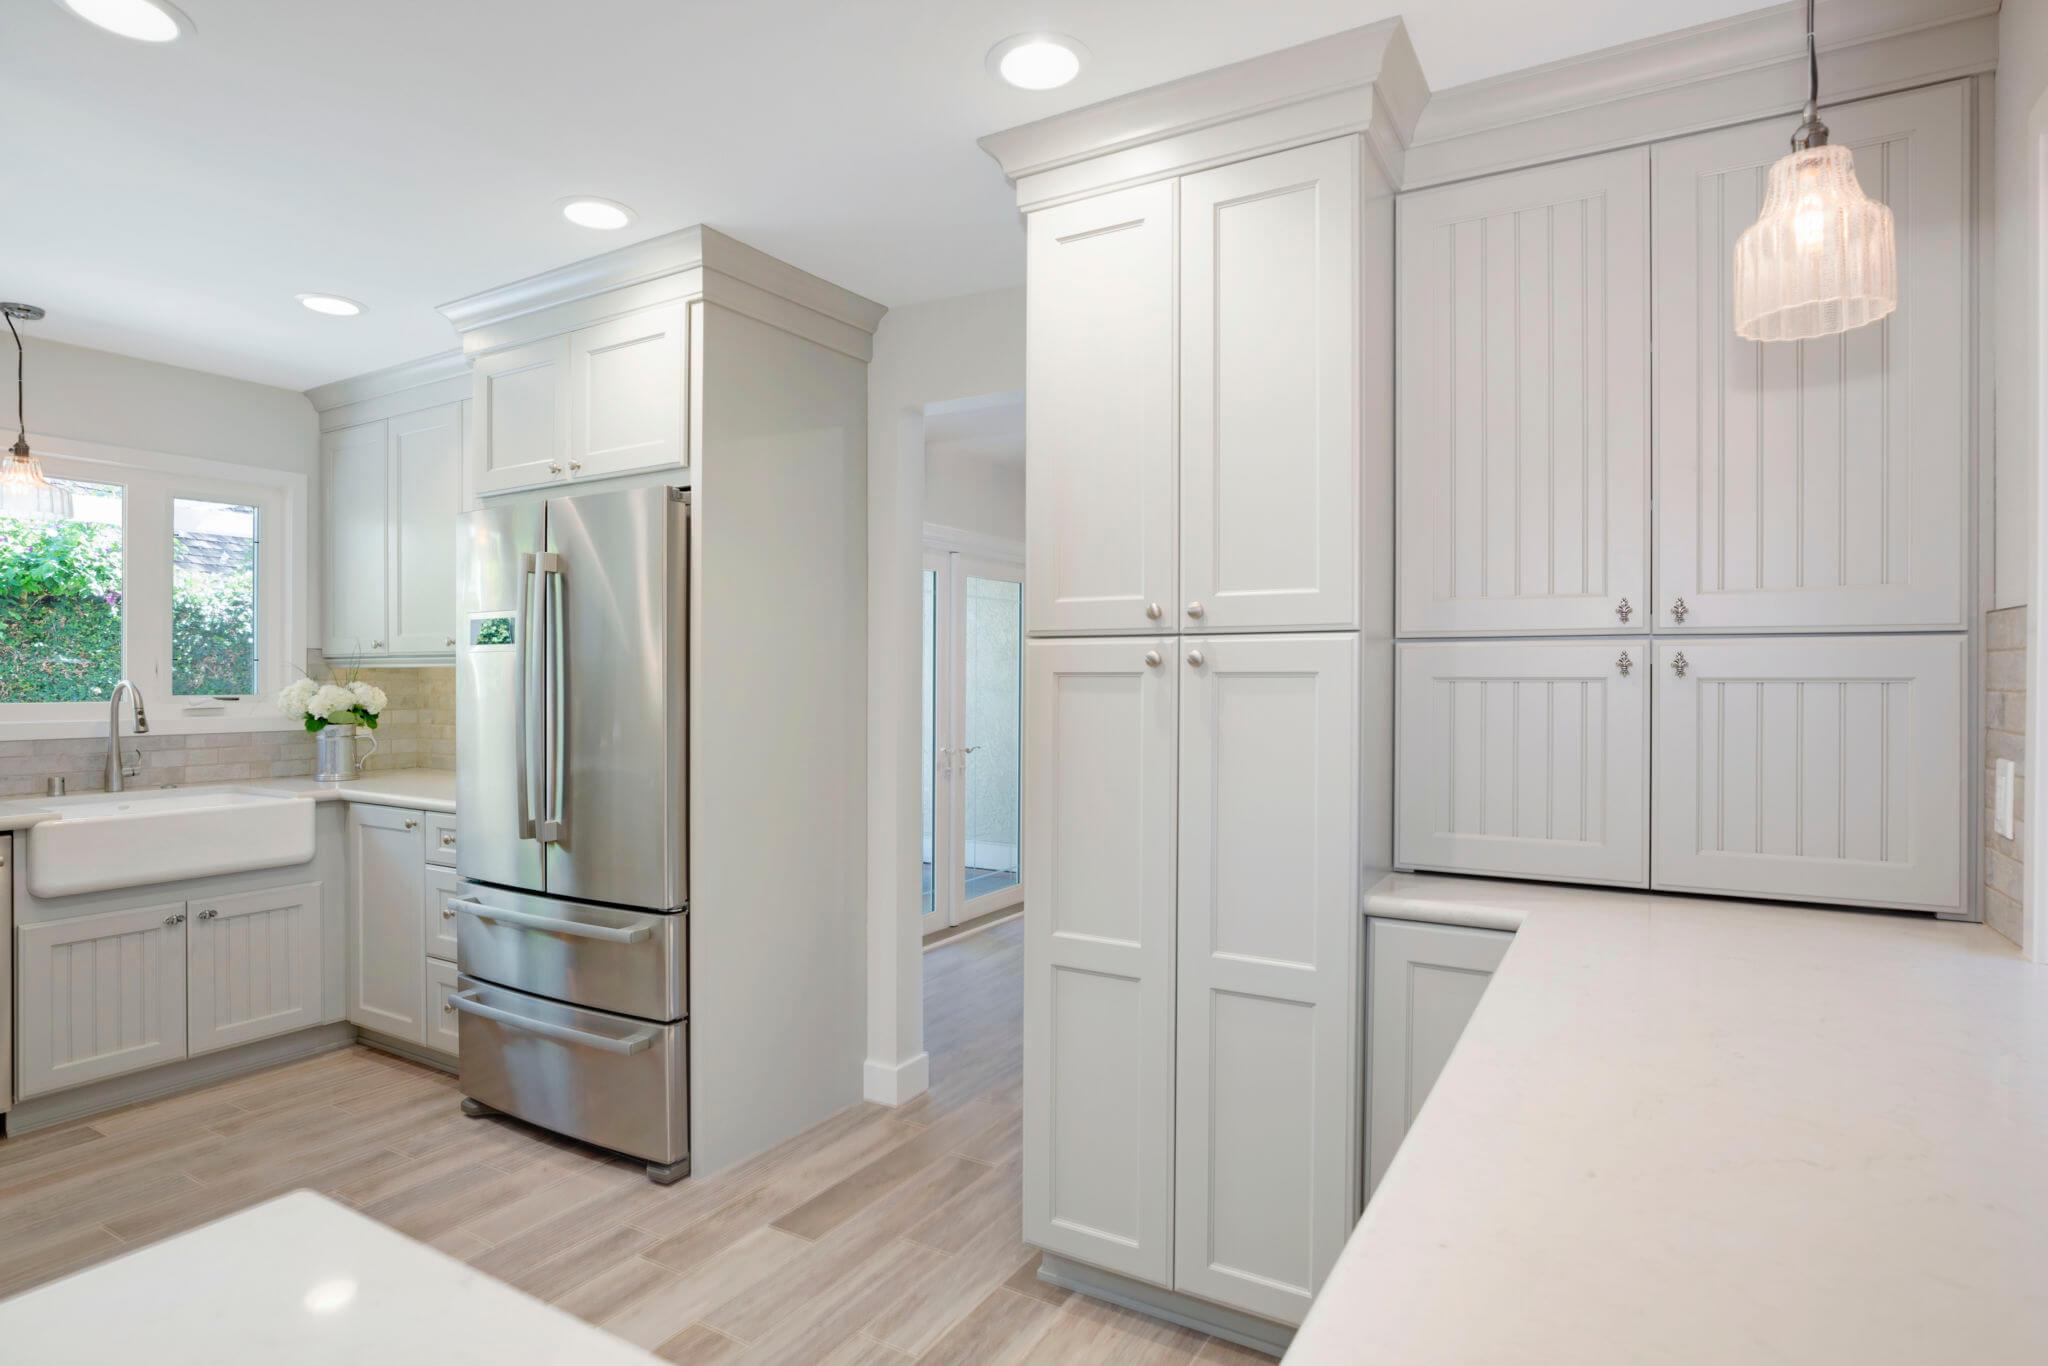 light blue custom kitchen cabinets with white countertops and stone backsplash